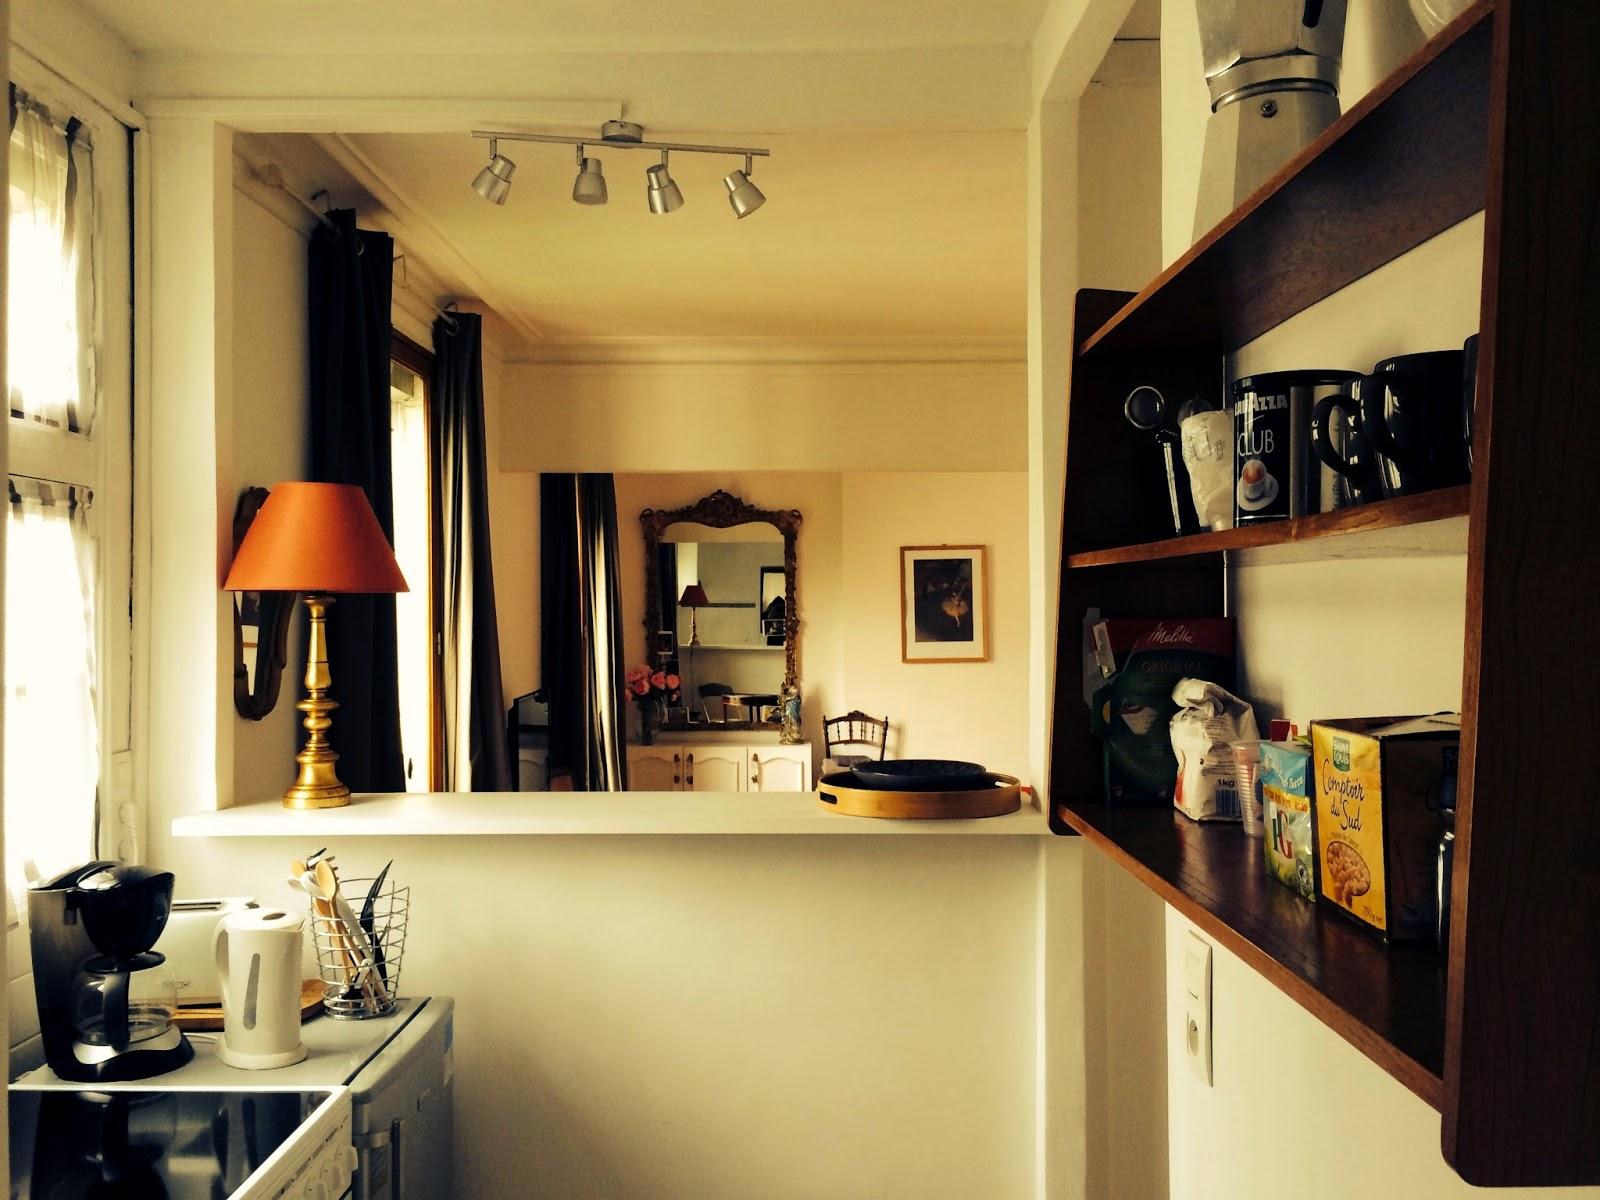 Affitto appartamento a parigi casa vacanza centrale - Casa vacanza a parigi ...